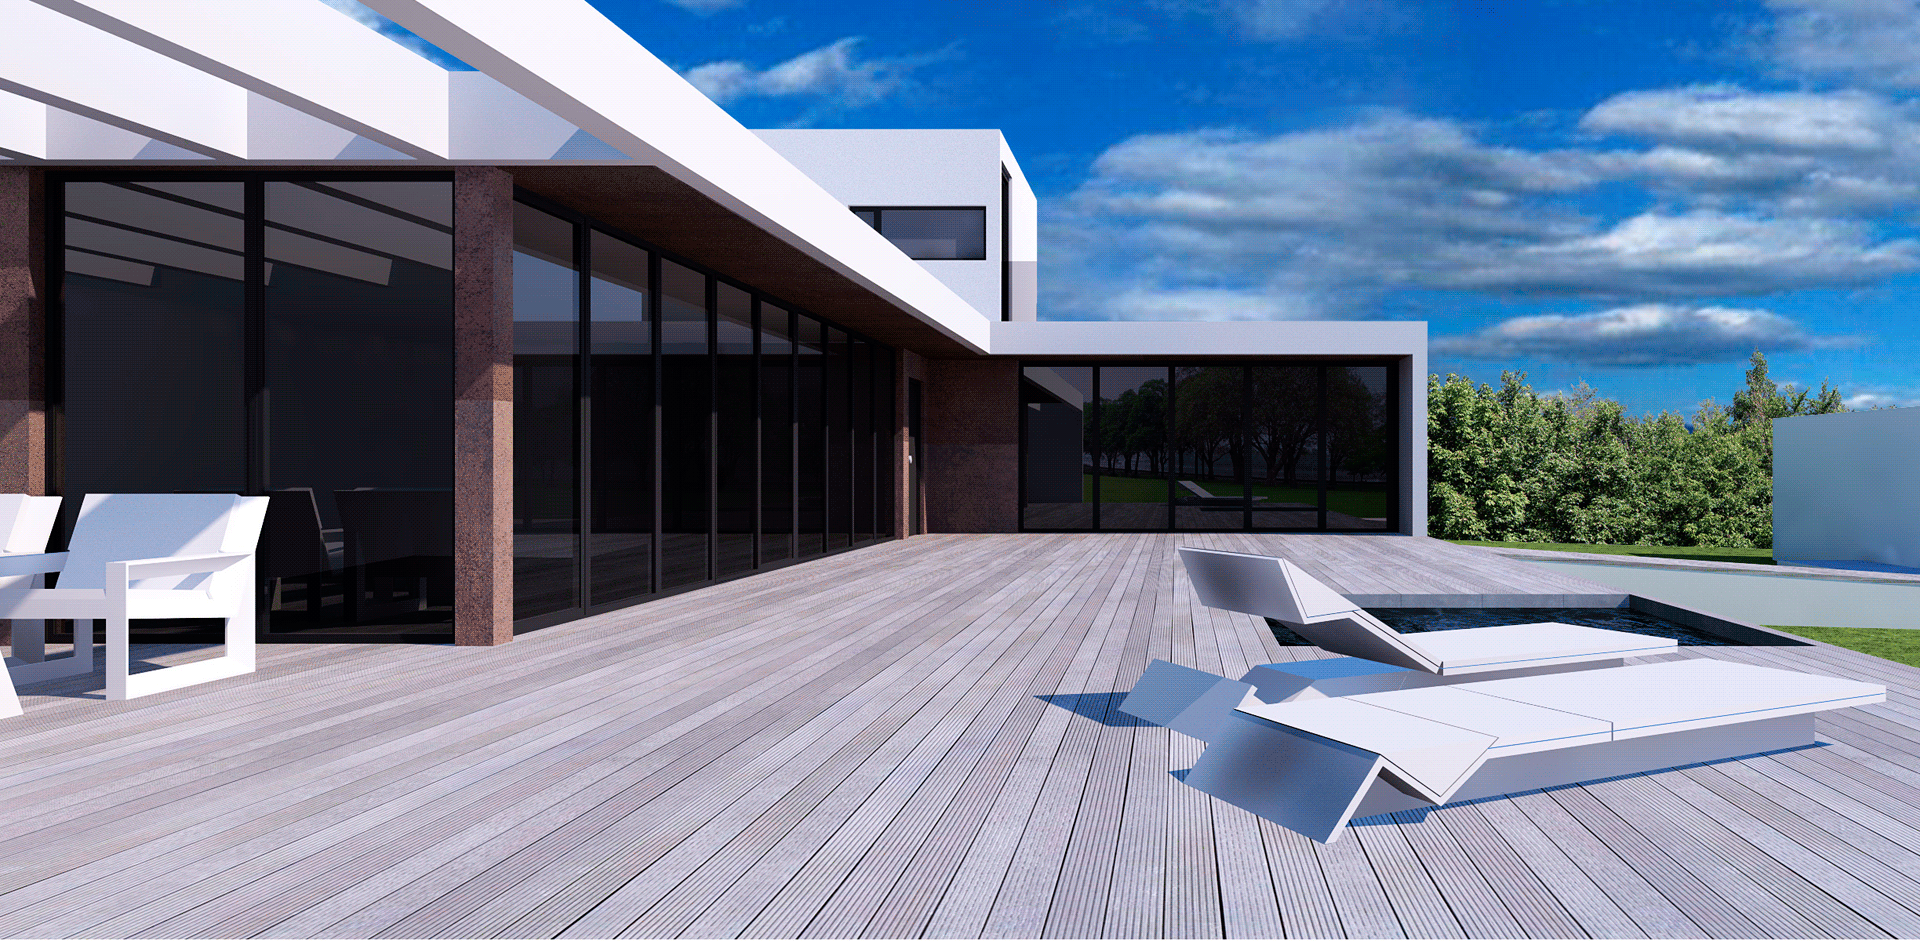 Casas con contenedores mojuru modular buildings - Contenedores casas prefabricadas ...